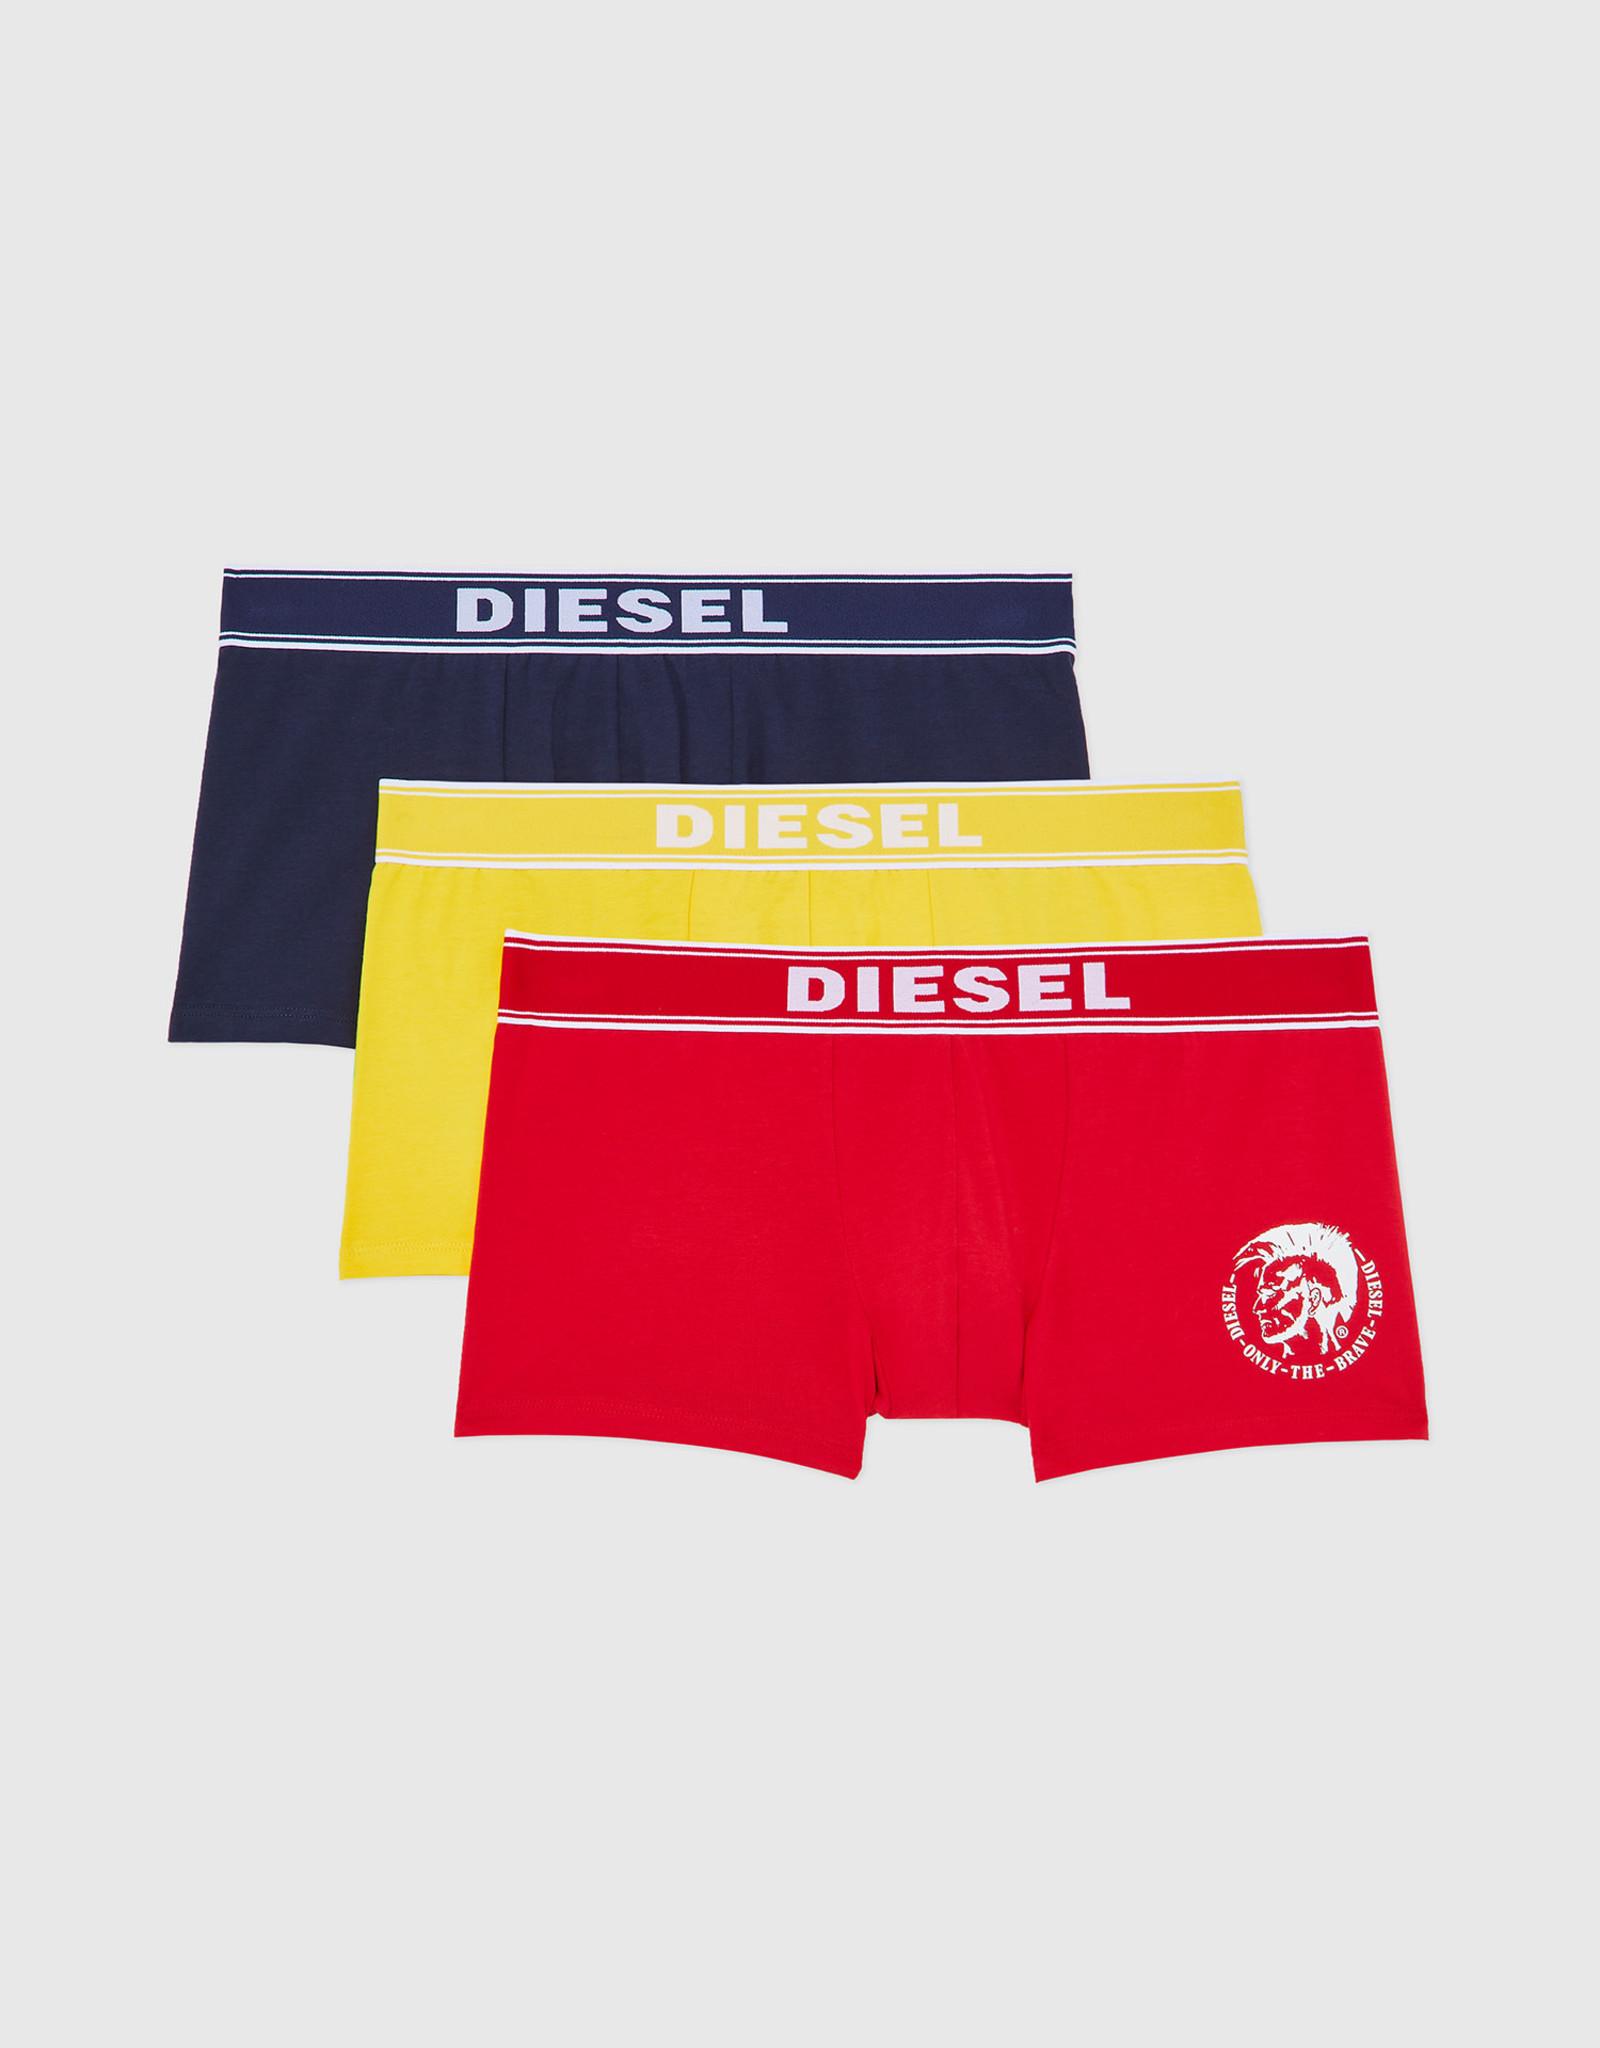 Diesel 3pk Shawn Mohawk Boxer